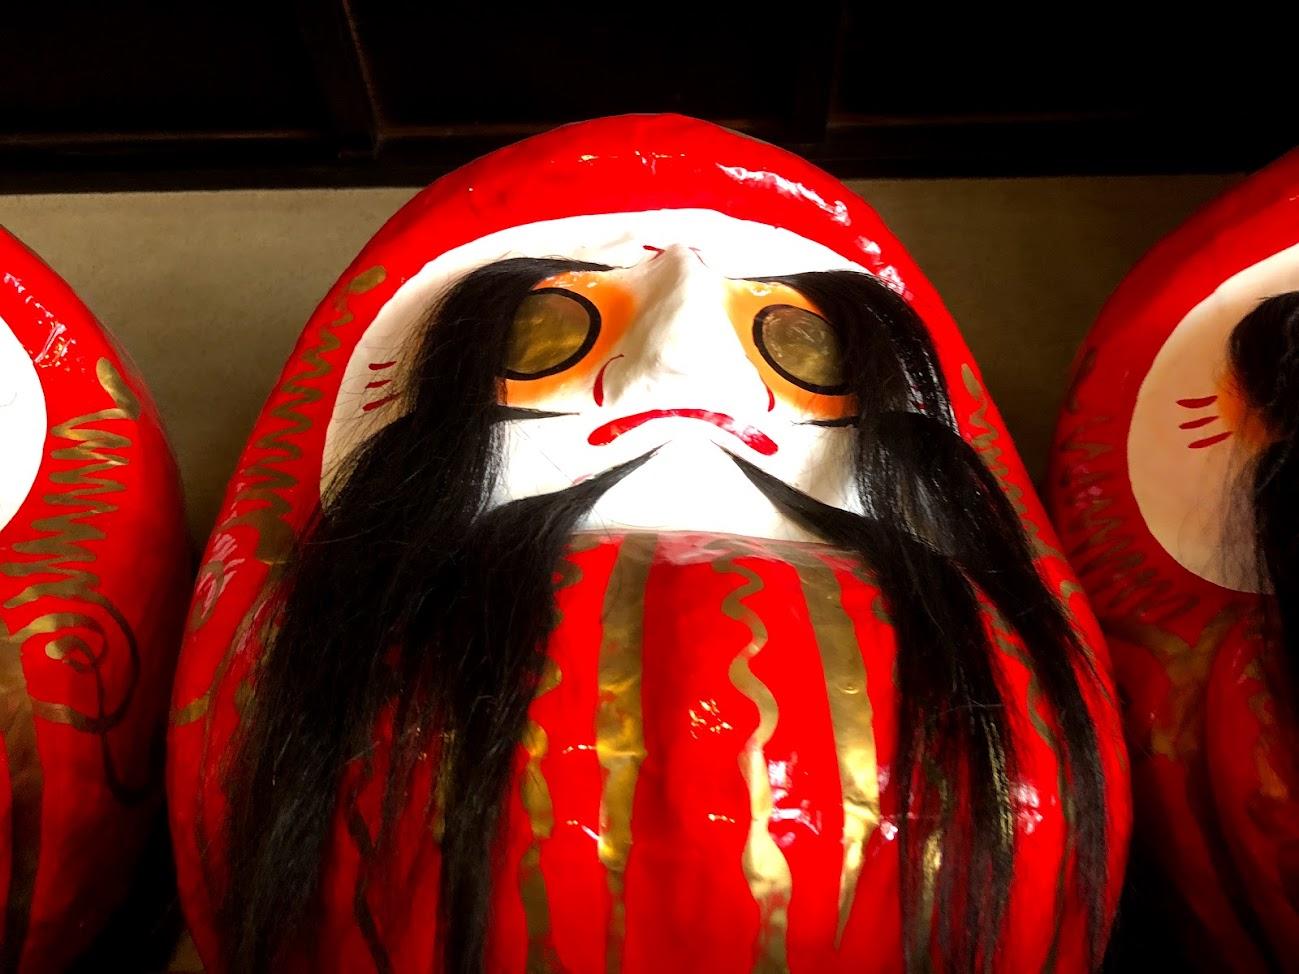 Strange daruma dolls2